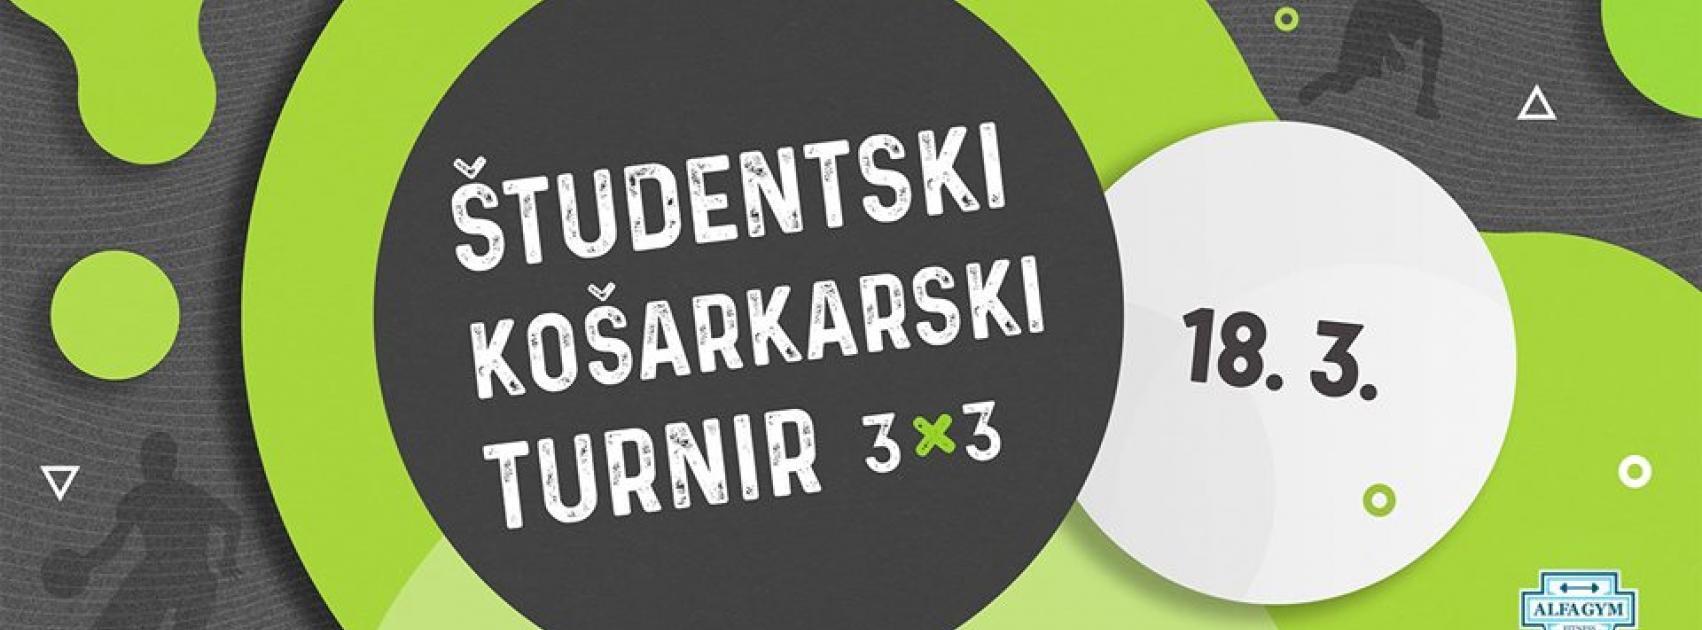 3x3_kosarkaski_turnir_1.jpg